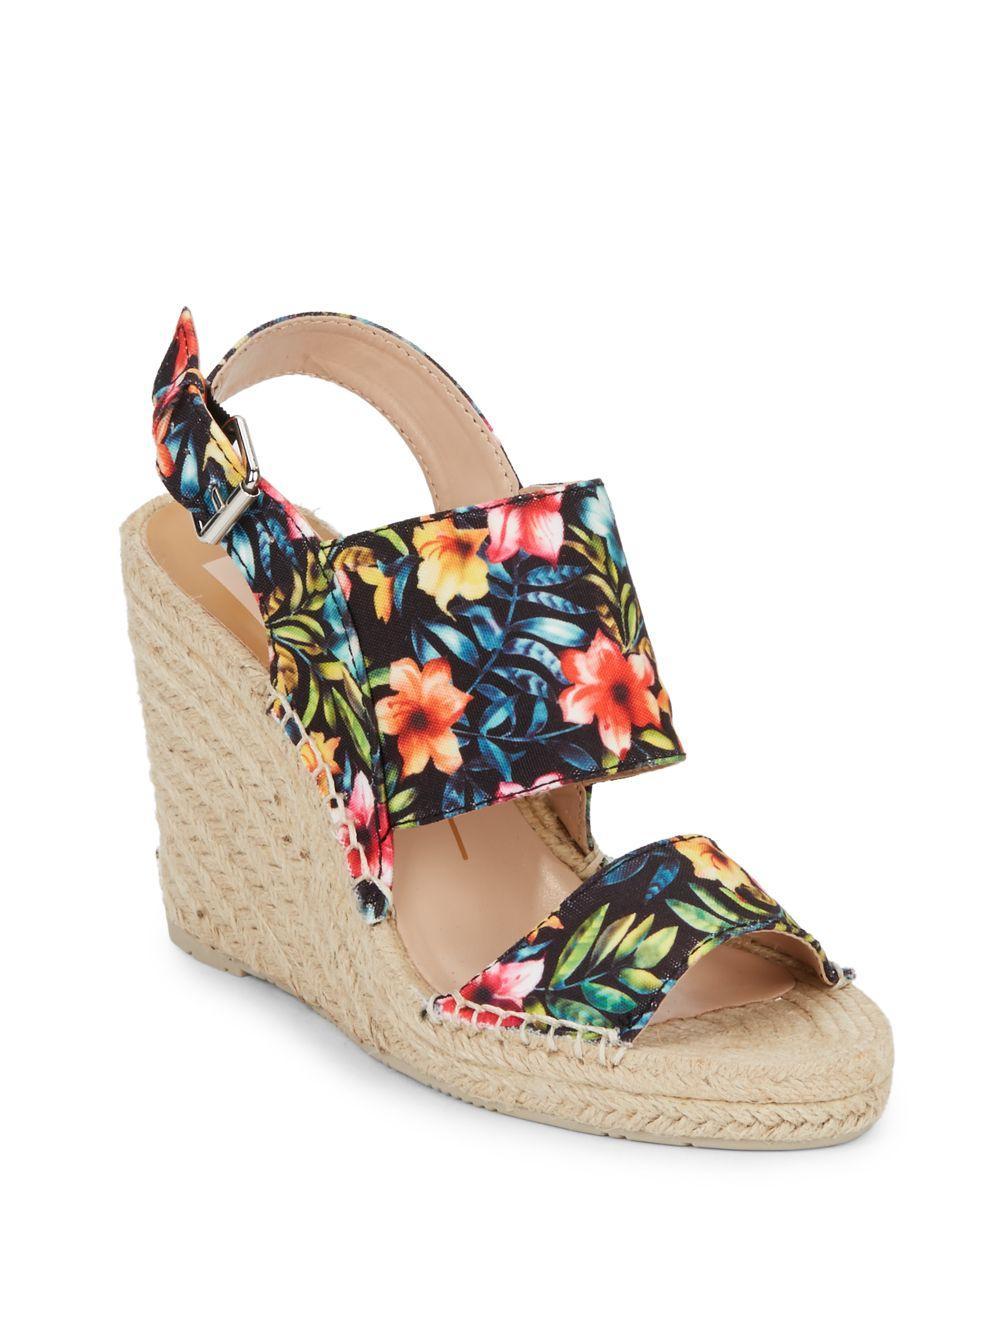 0ee1bda23c4 Dolce Vita Shady Floral-print Canvas Espadrille Wedge Sandals - Lyst